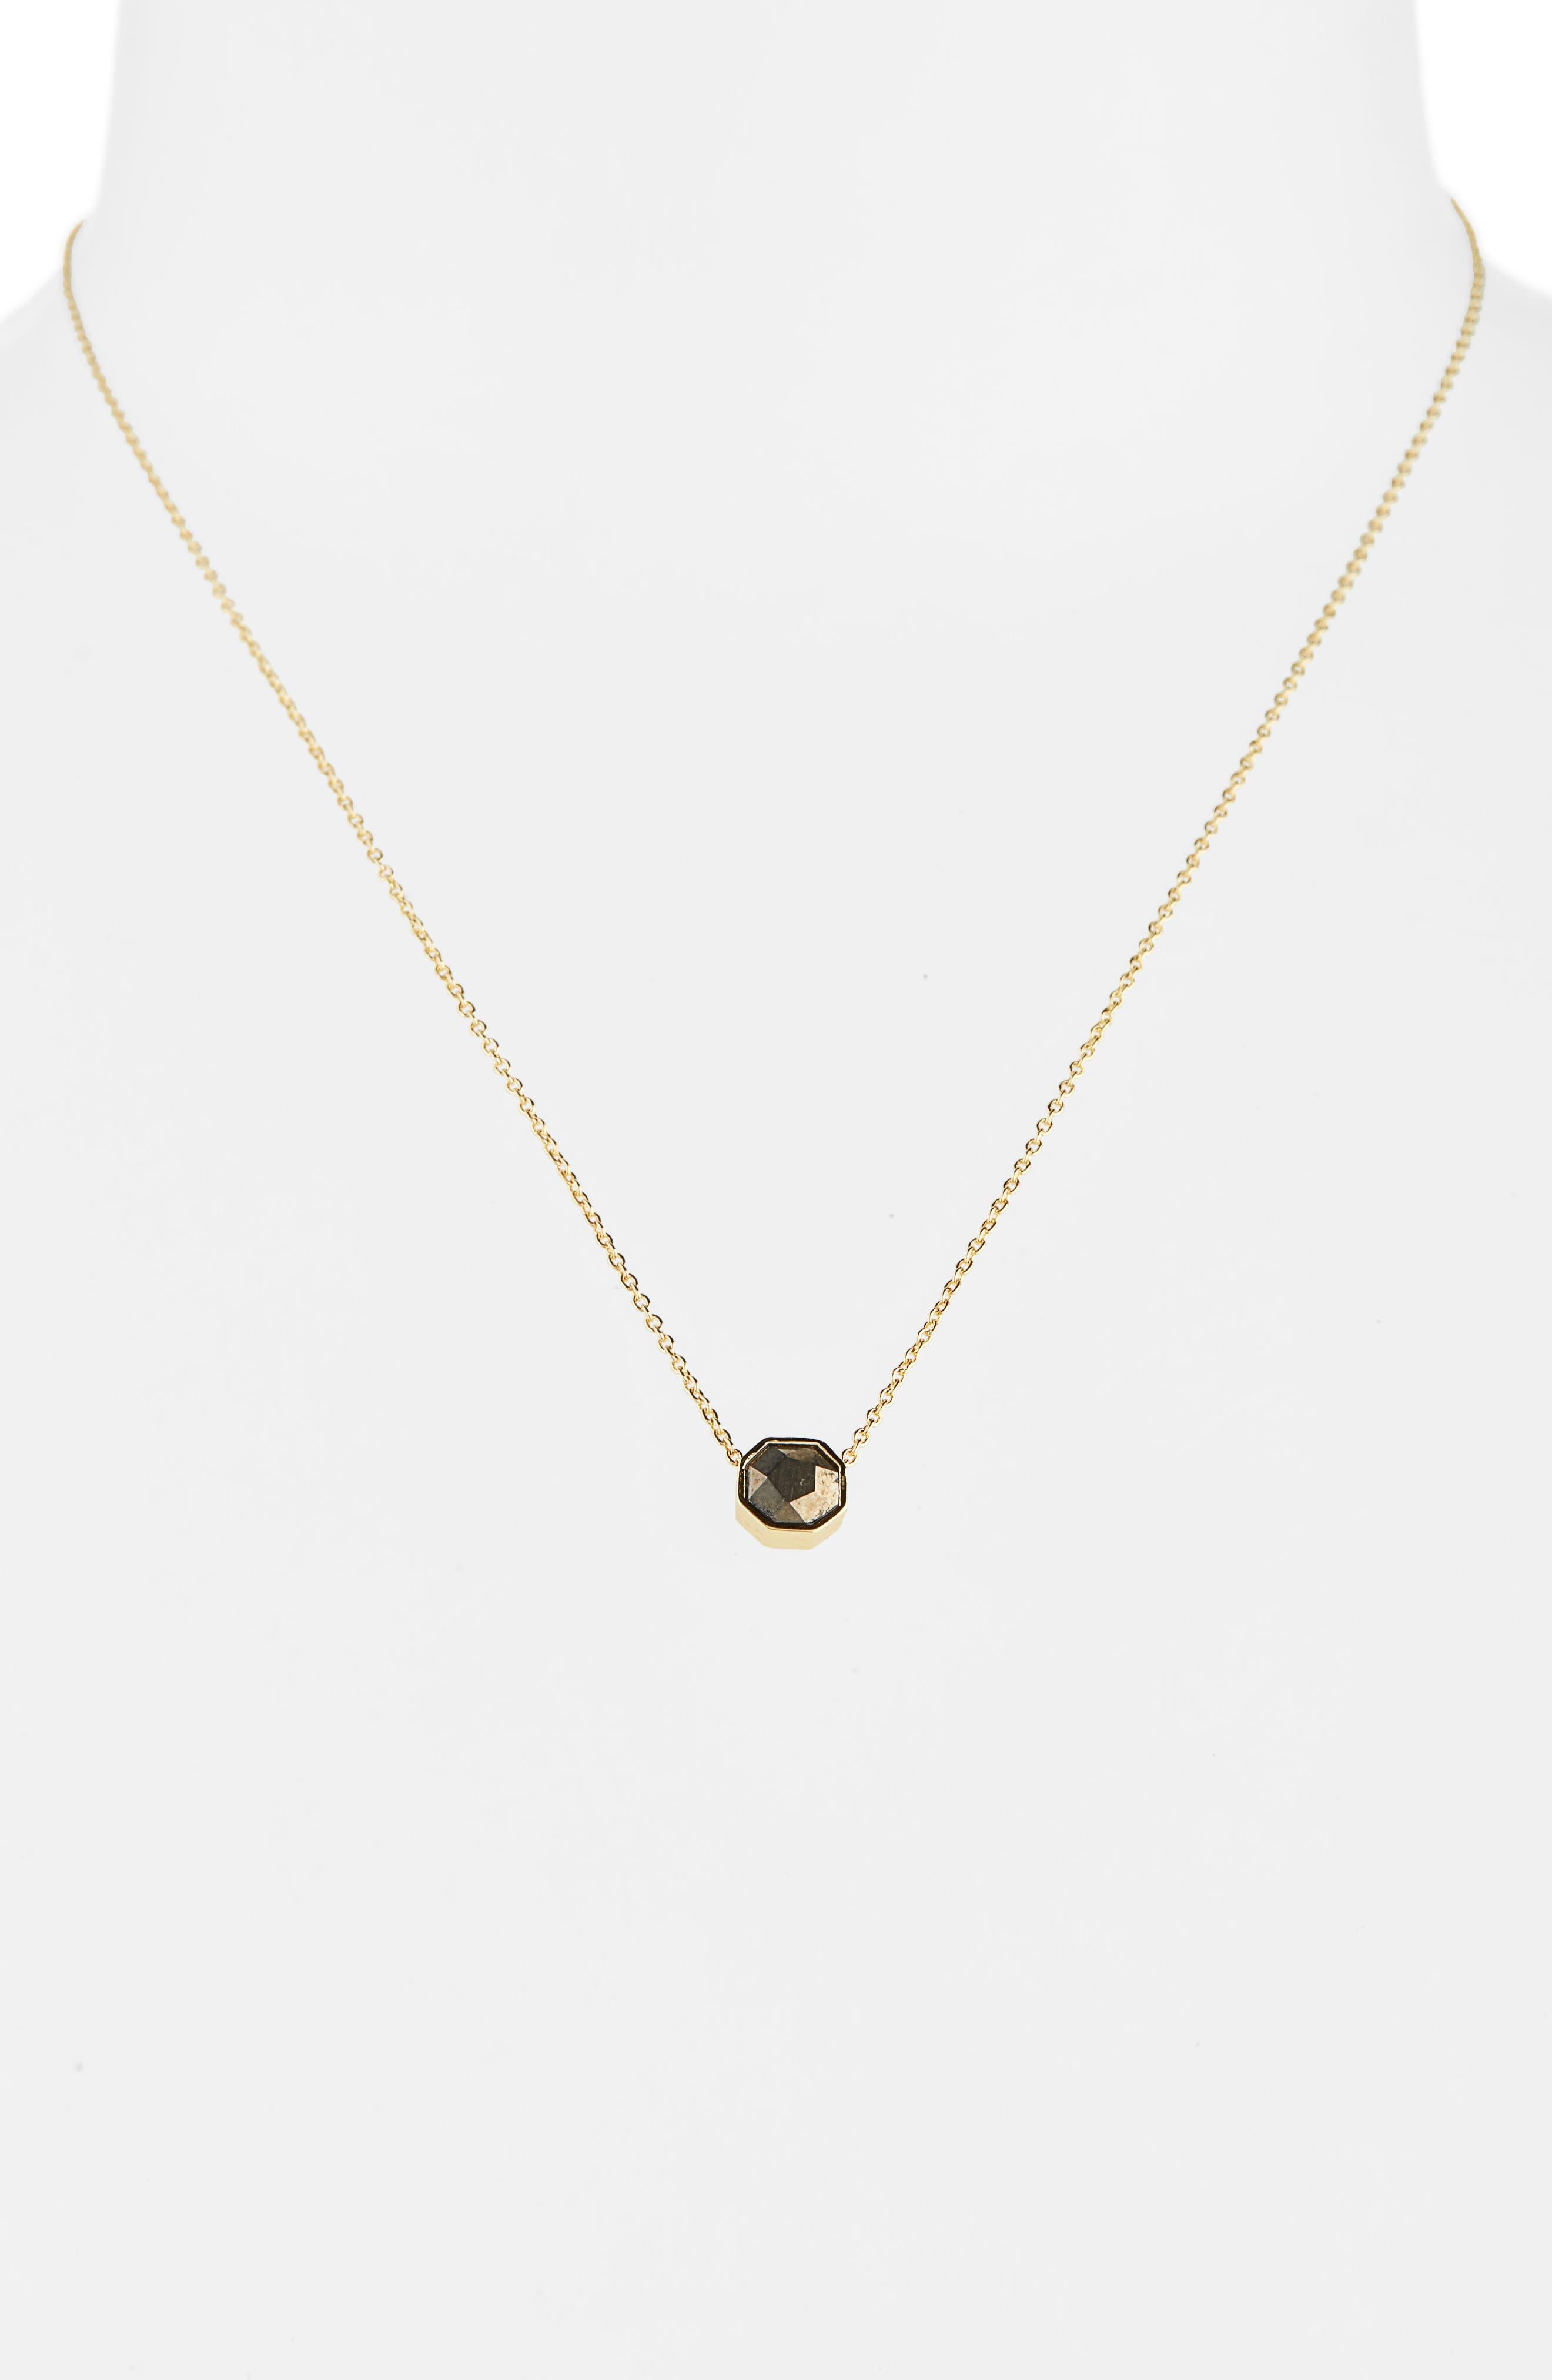 GORJANA Power Gemstone Charm Adjustable Necklace, Main, color, STRENGTH/ PYRITE/ GOLD